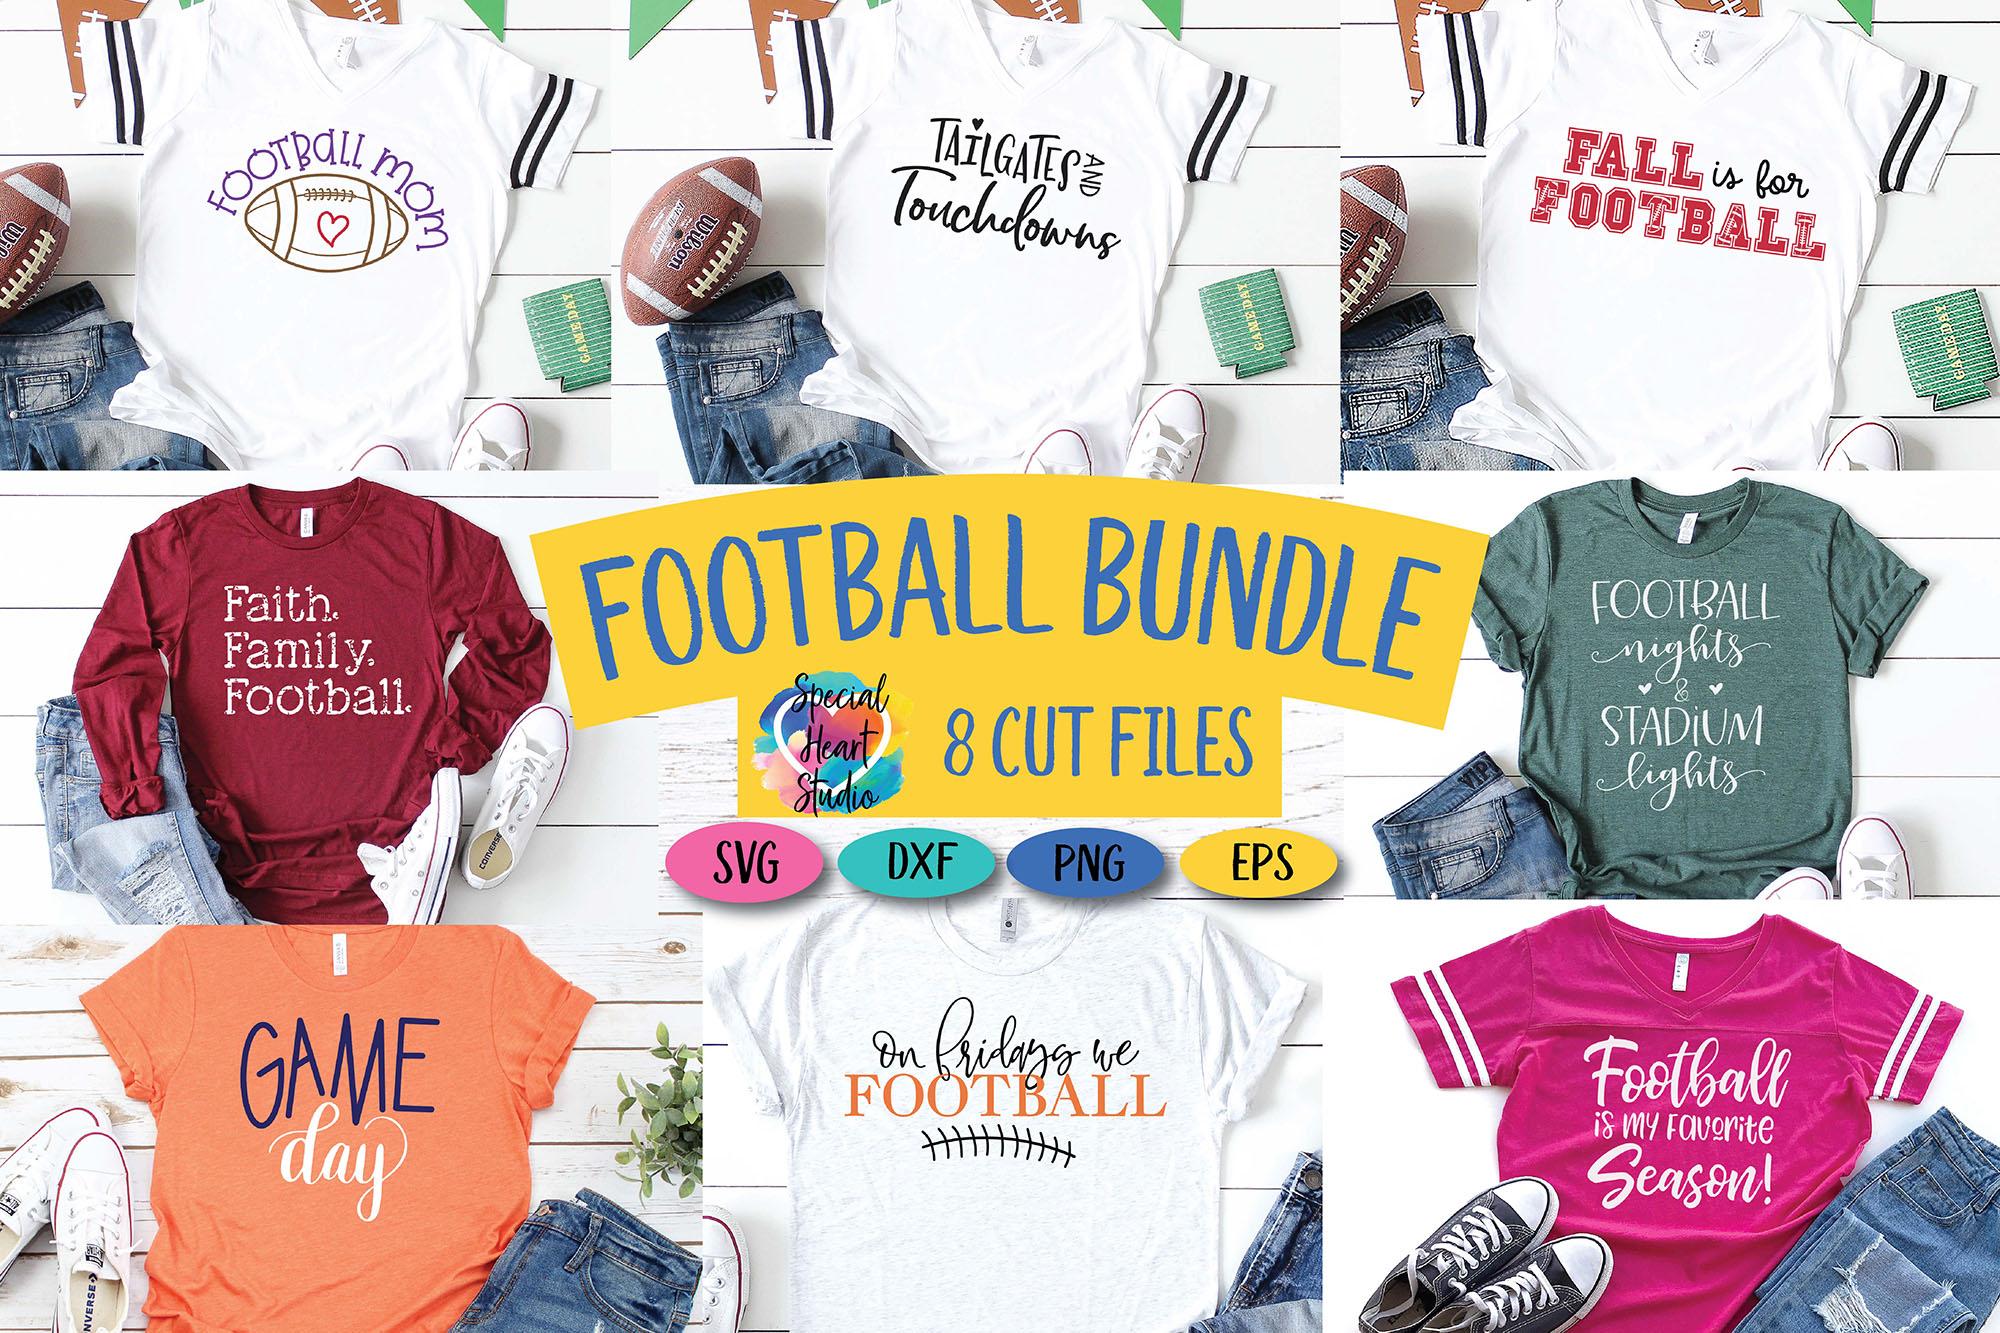 Football Bundle - An football fan SVG Cut File Bundle example image 1